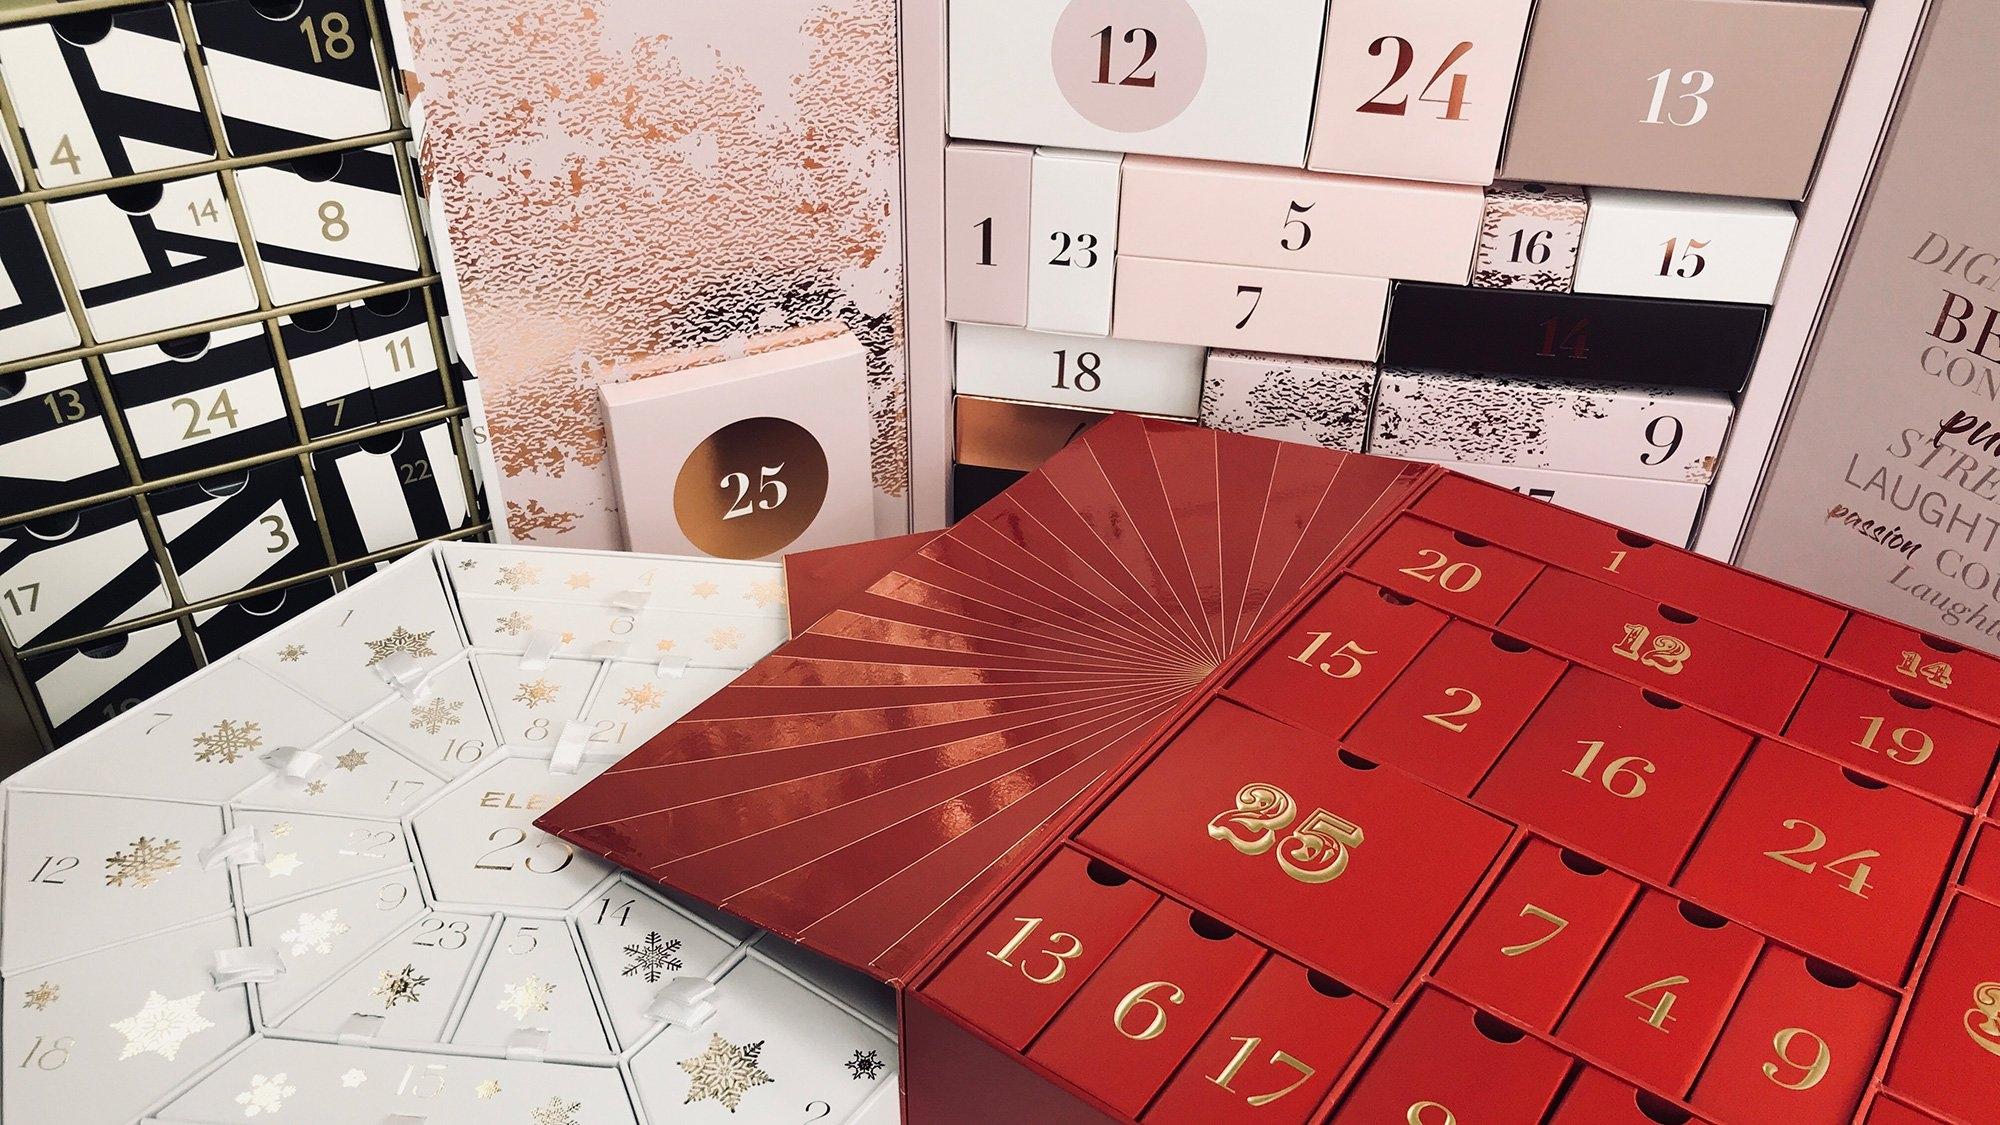 Beauty Advent Calendars On Sale: Bag A Bargain Before 2019 No 7 Advent Calendar 2019